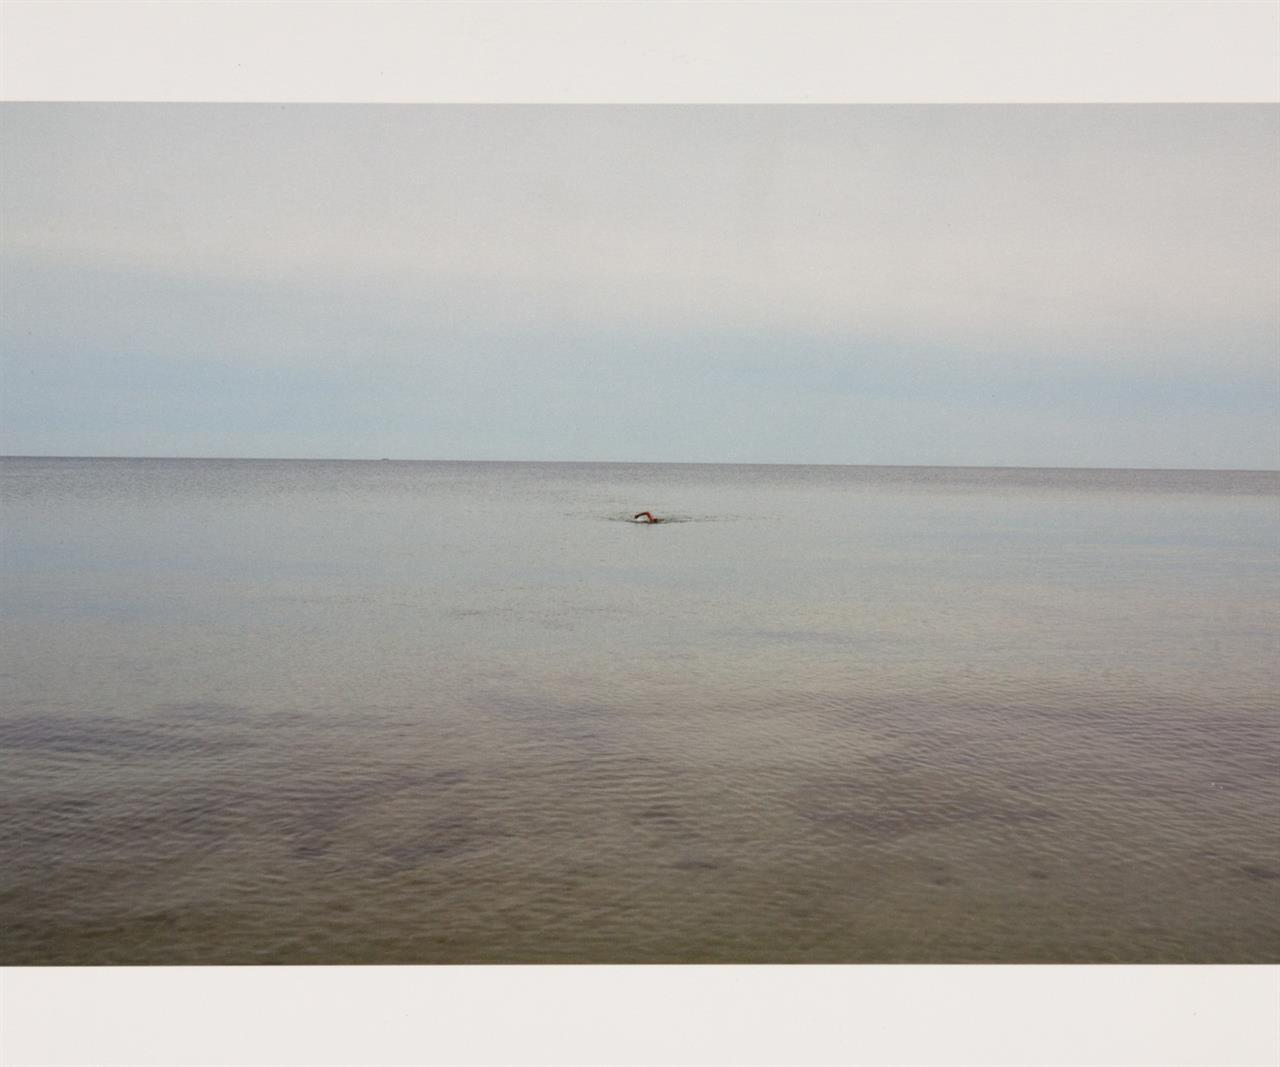 Juergen Teller. Swimming, Glemmingebro, Sweden. 2015 (2017). Giclée print. Ex. 24/120. + Sign. Zertifikat. T.z.K. 107.